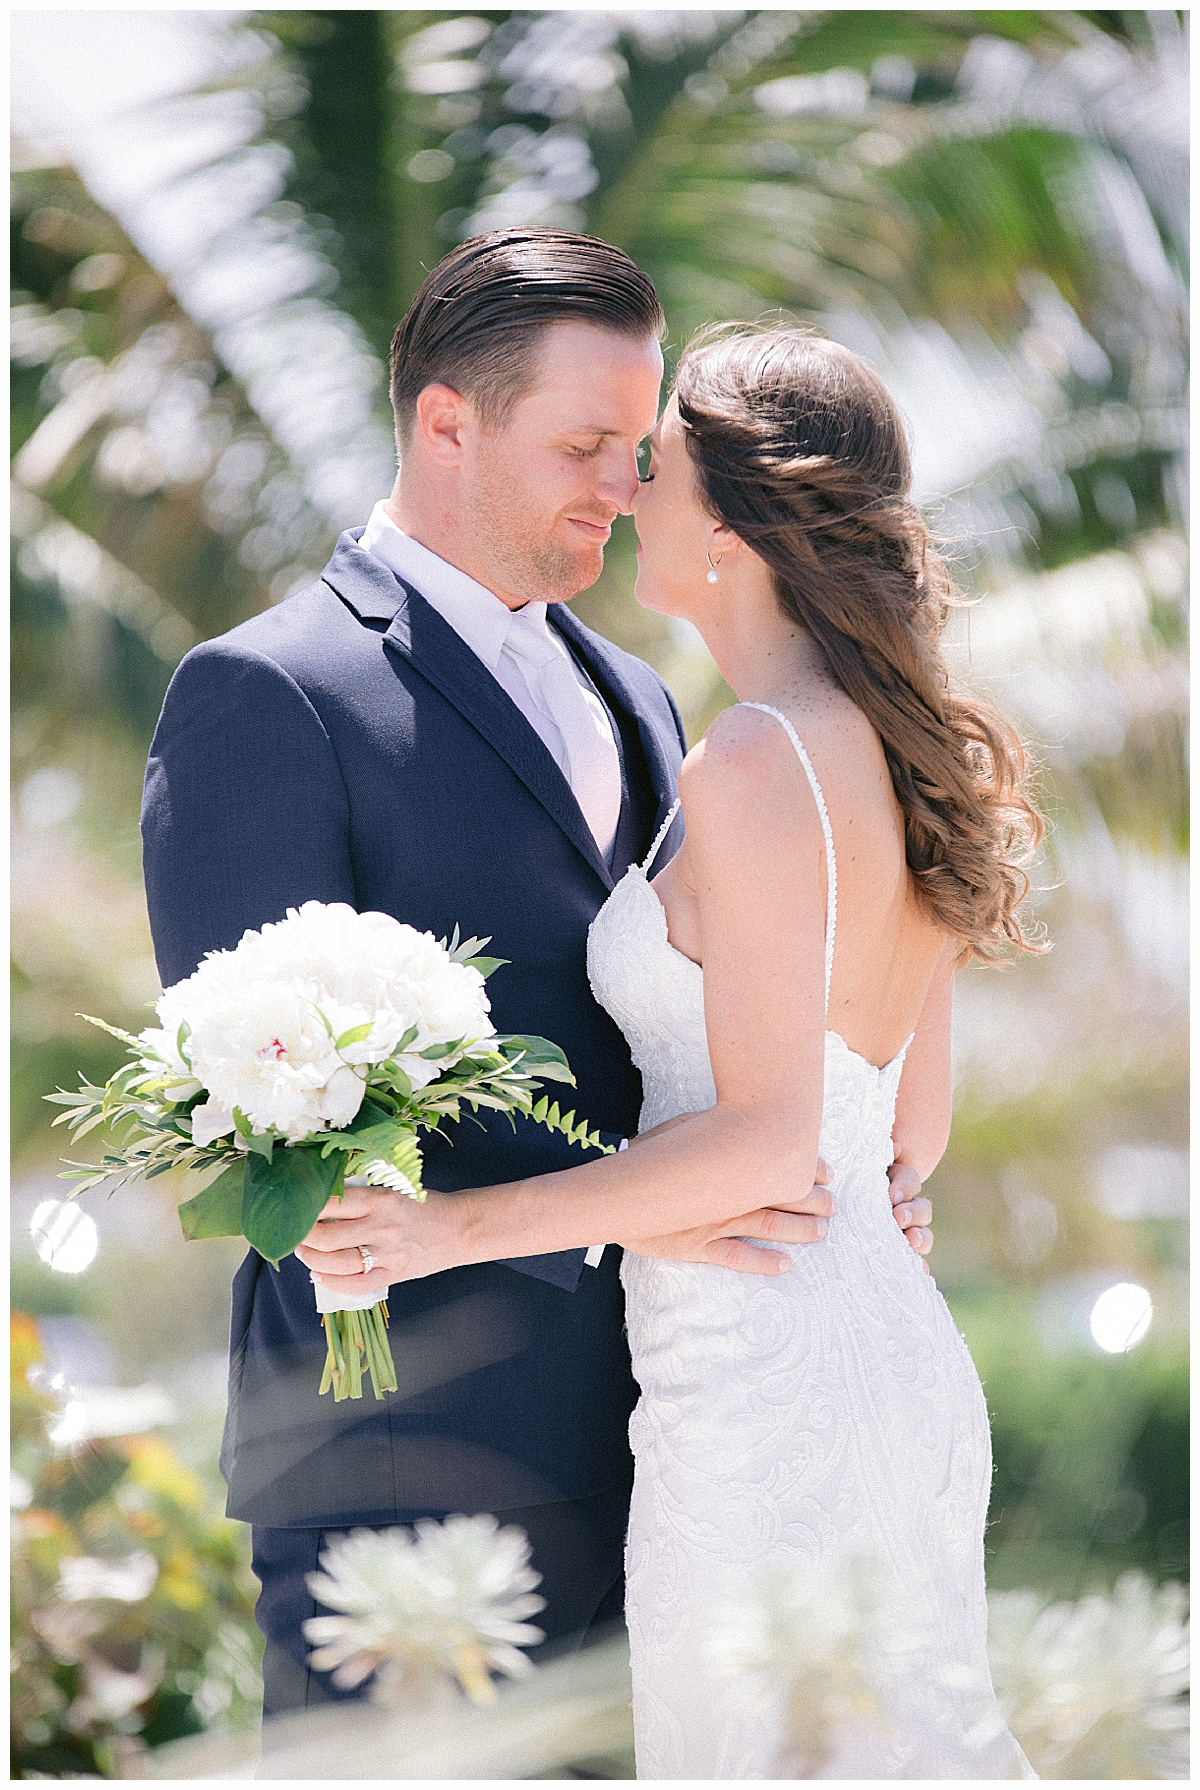 Bride and groom portraits at Hutchinson Shores Resort and Spa